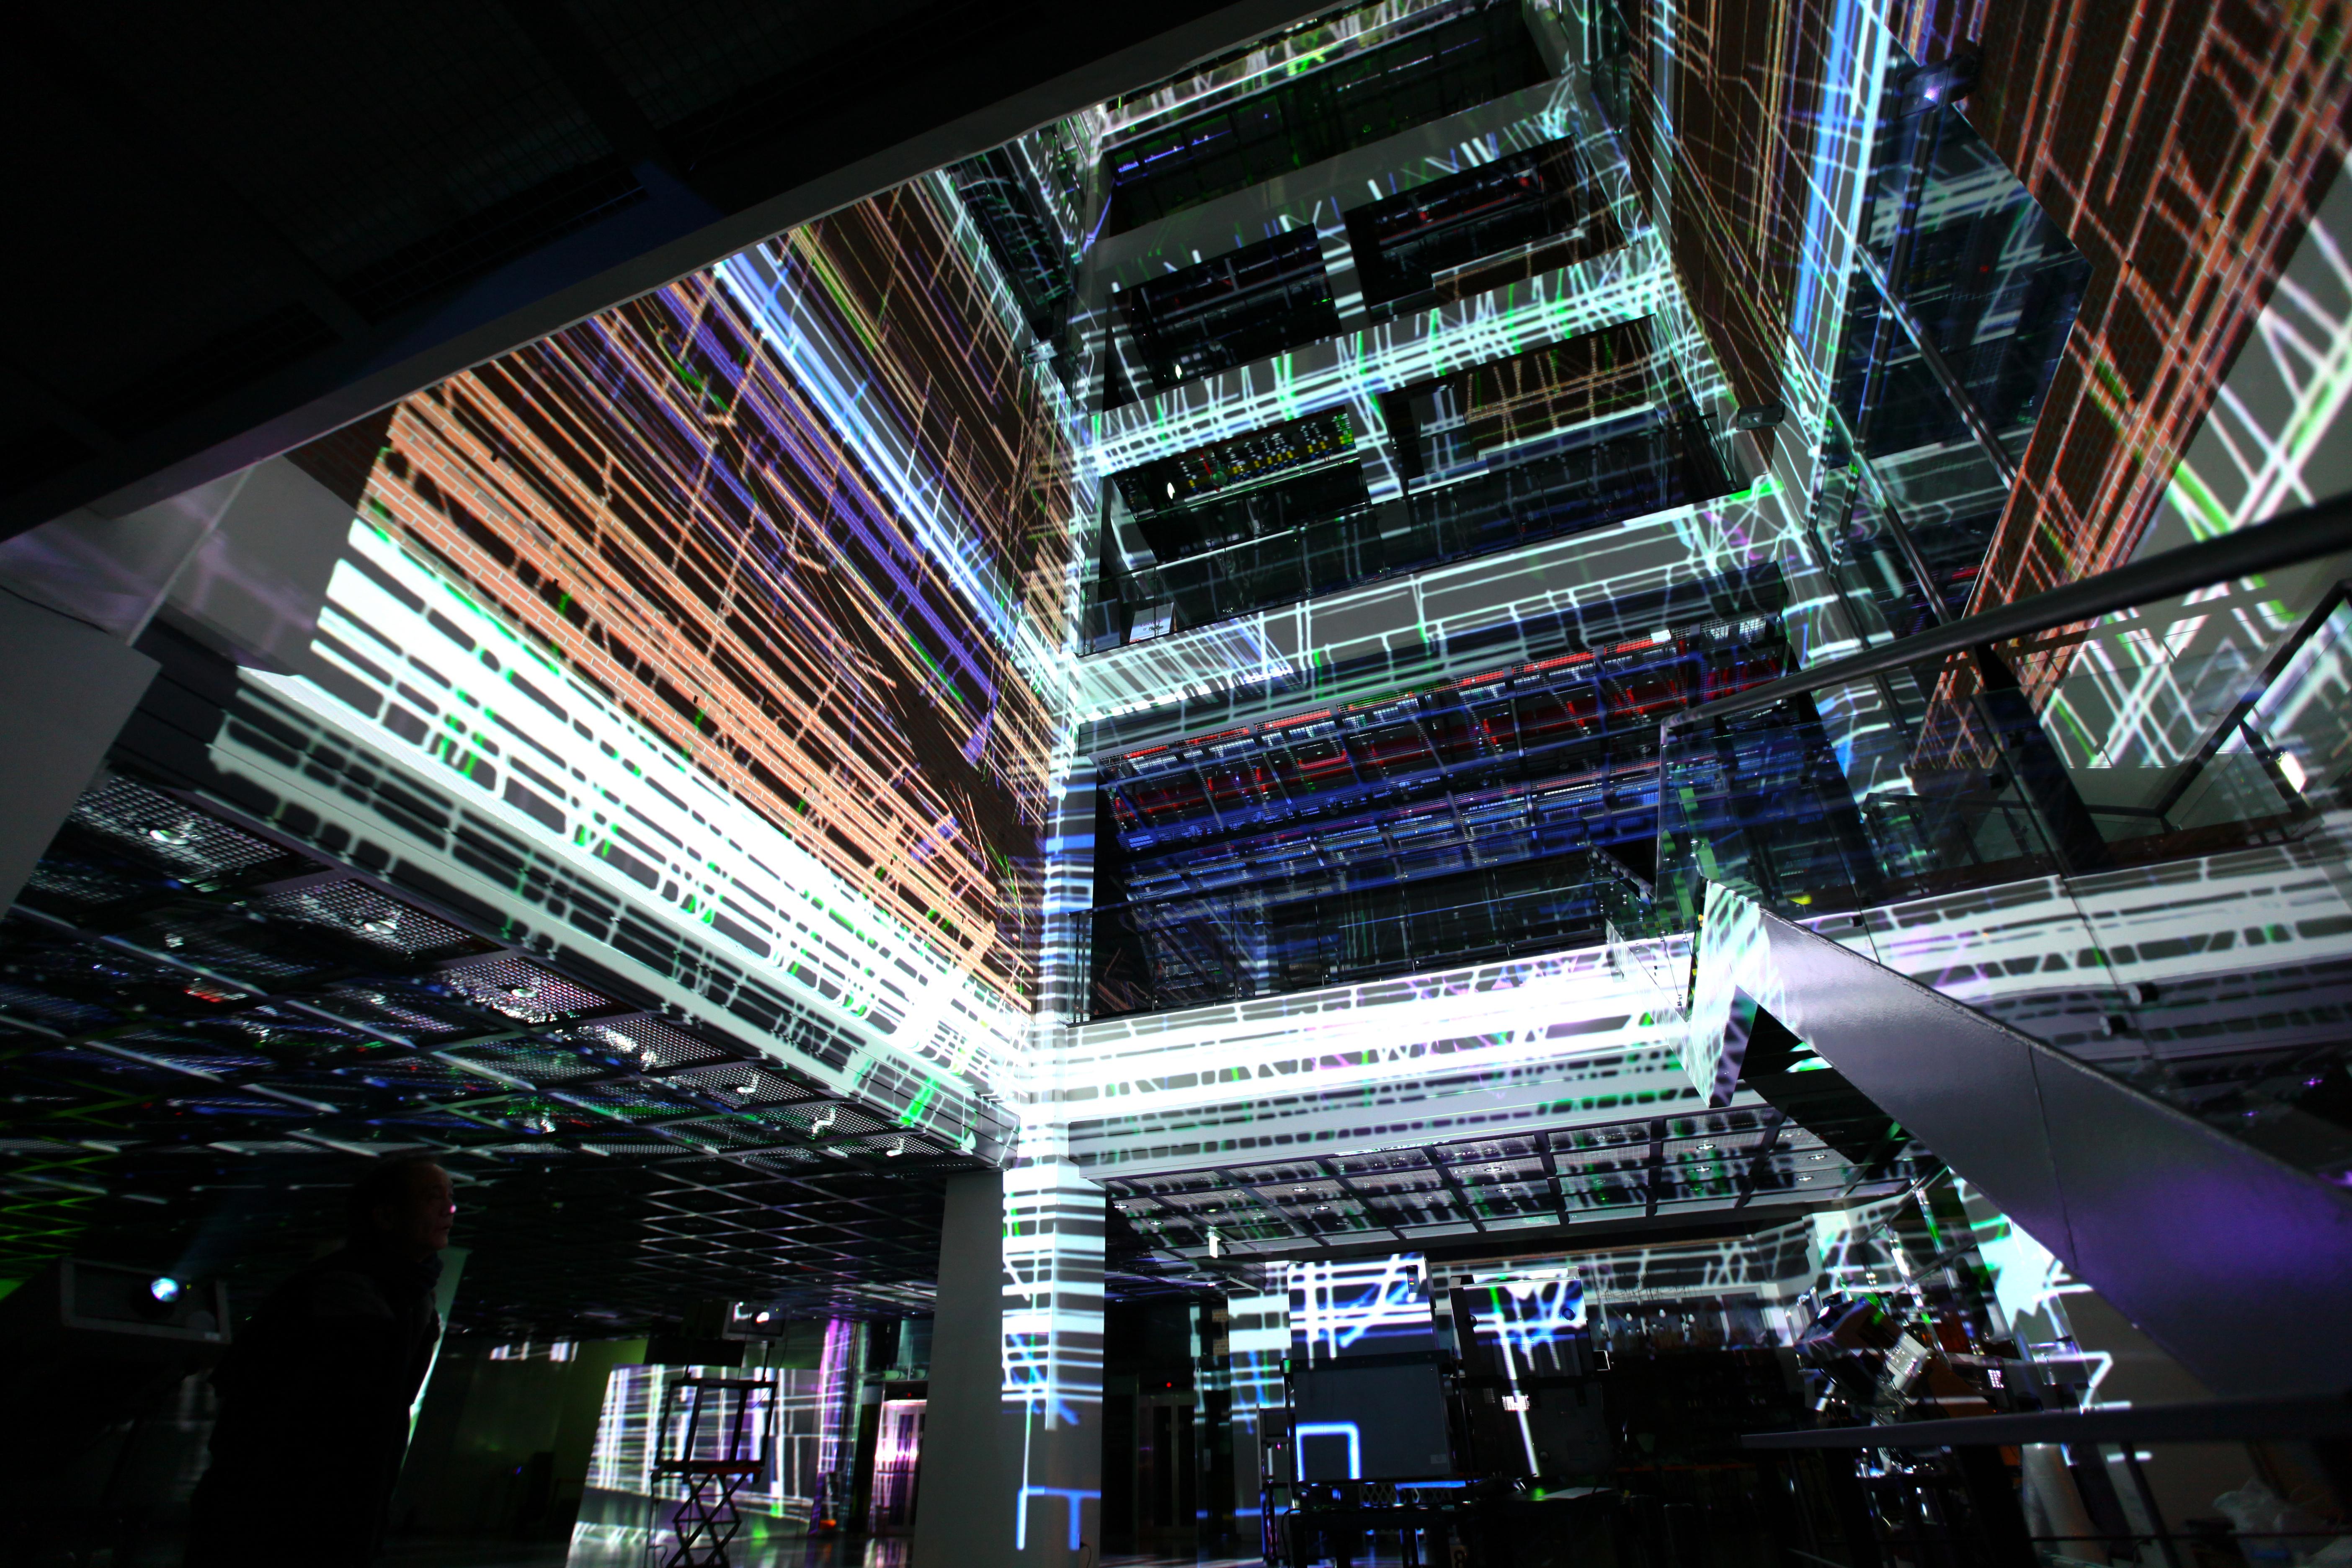 Daegu Art Factory Media Facade